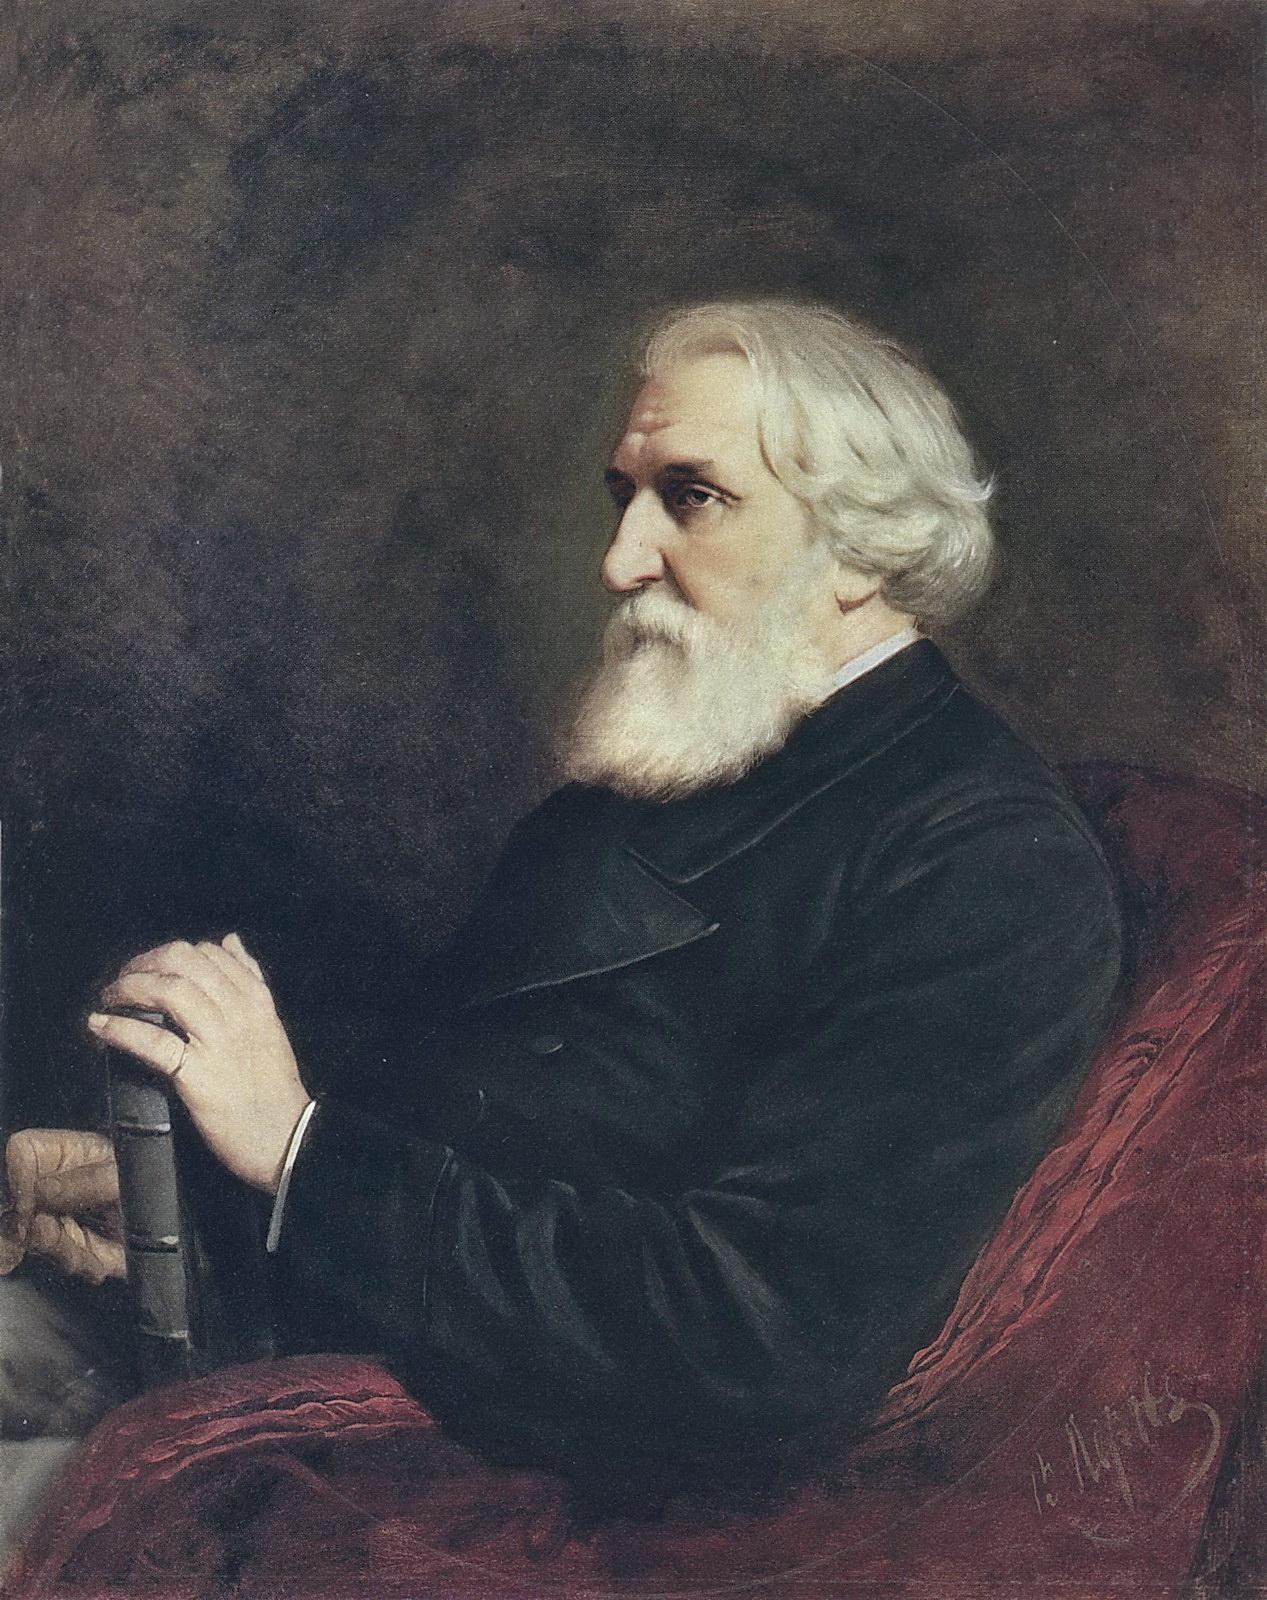 Ivan Turgenjev Portrait-of-the-author-ivan-turgenev-1872